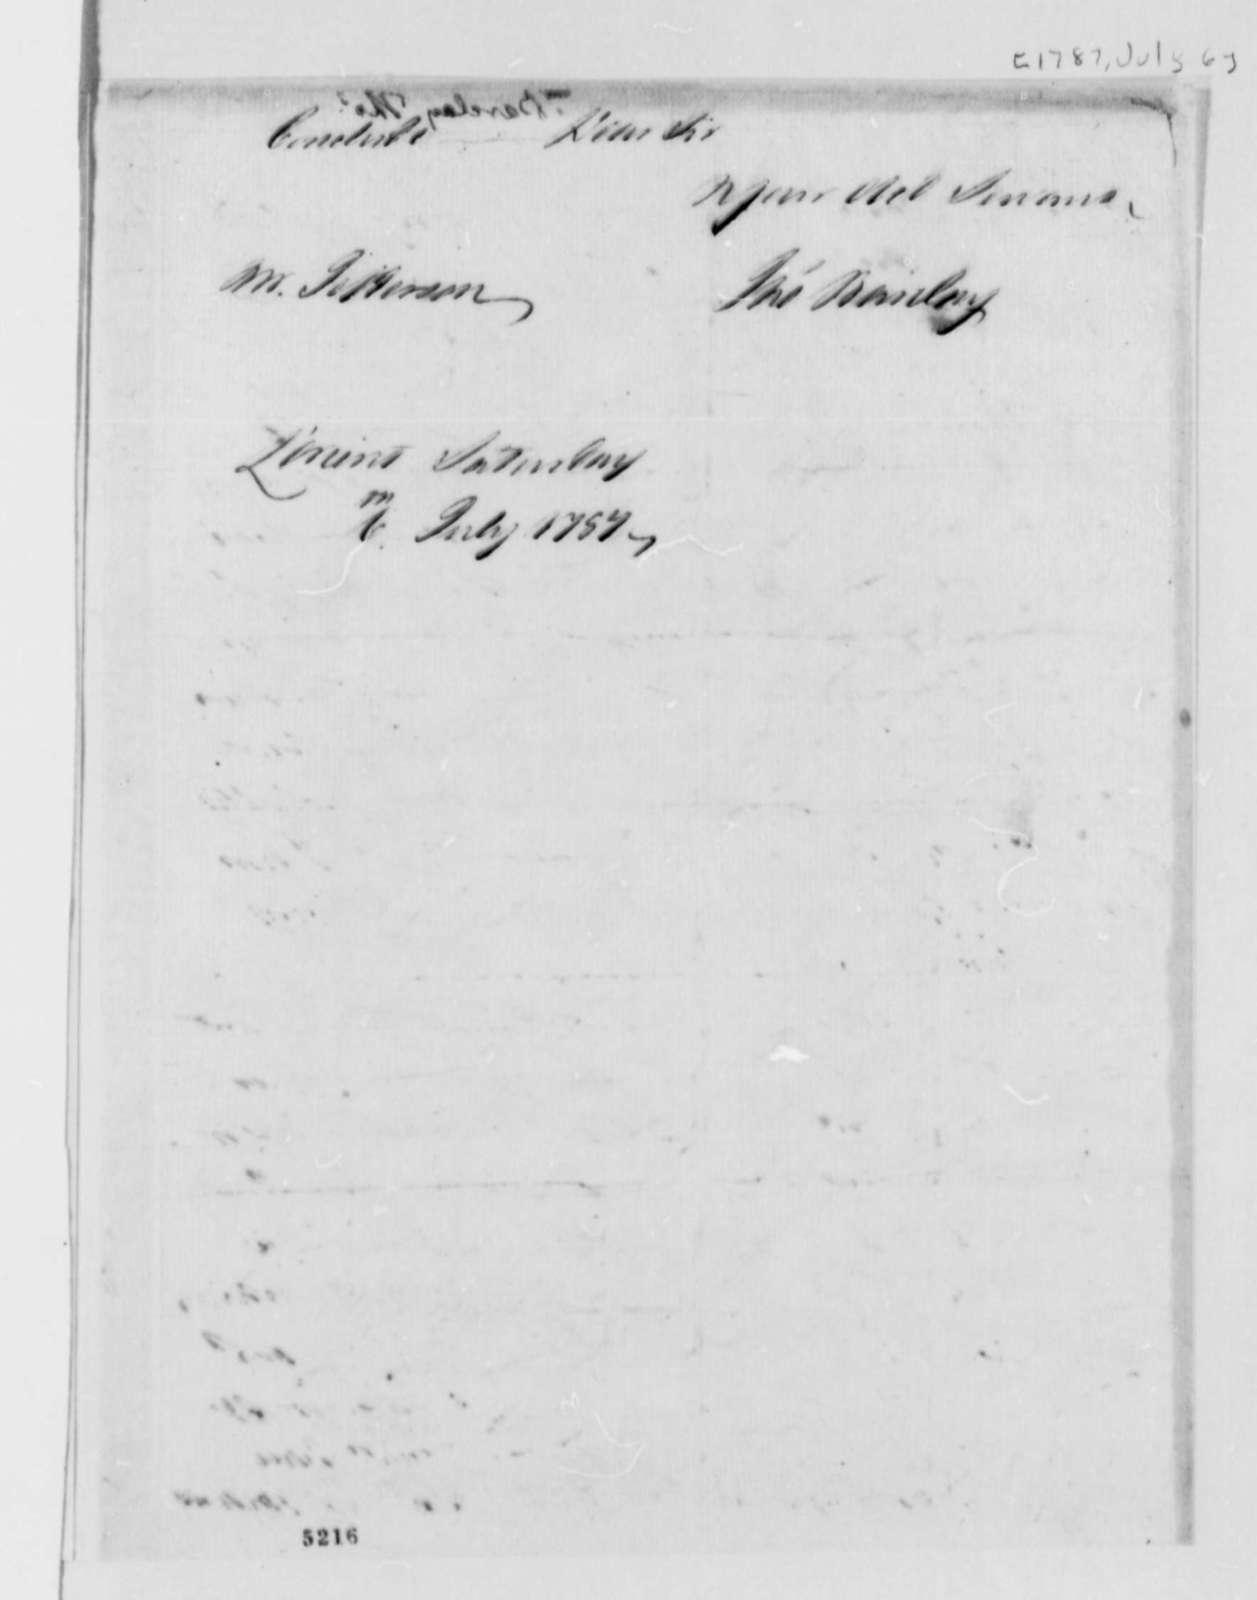 Thomas Barclay to Thomas Jefferson, July 6, 1787